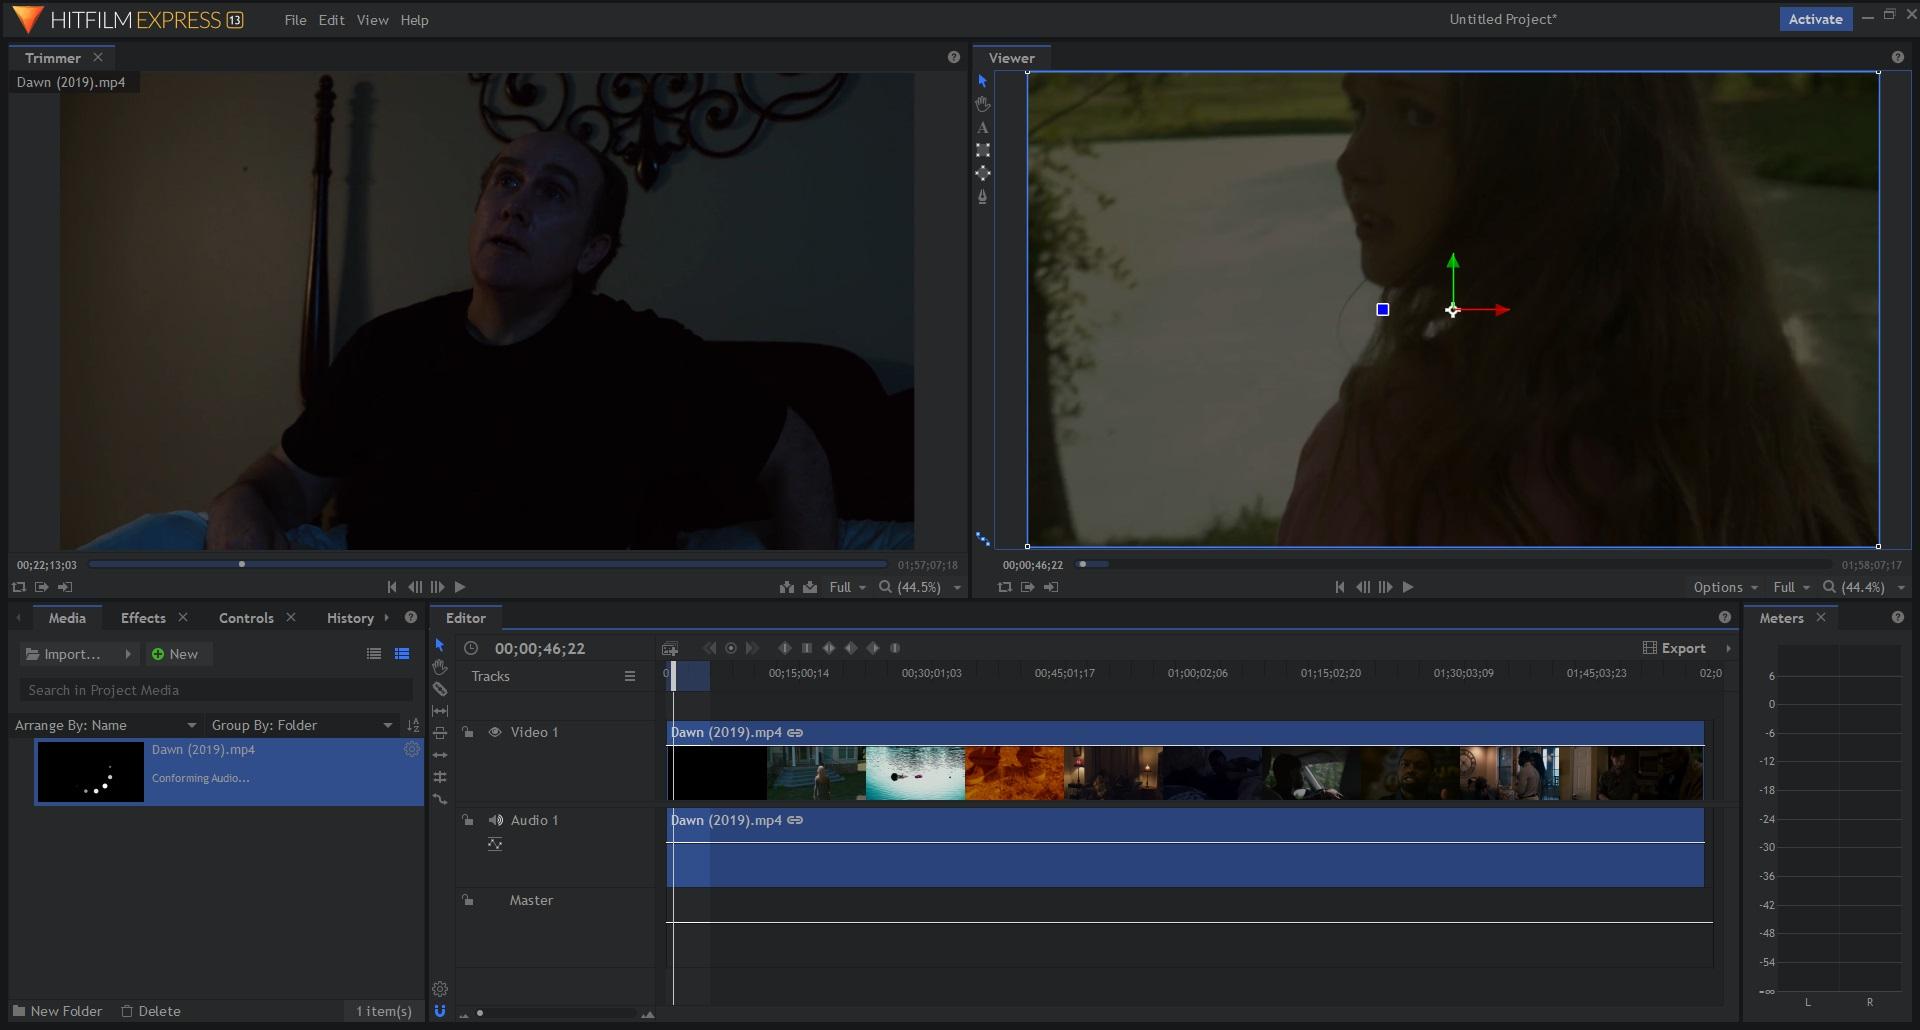 HitFilm best video editing software